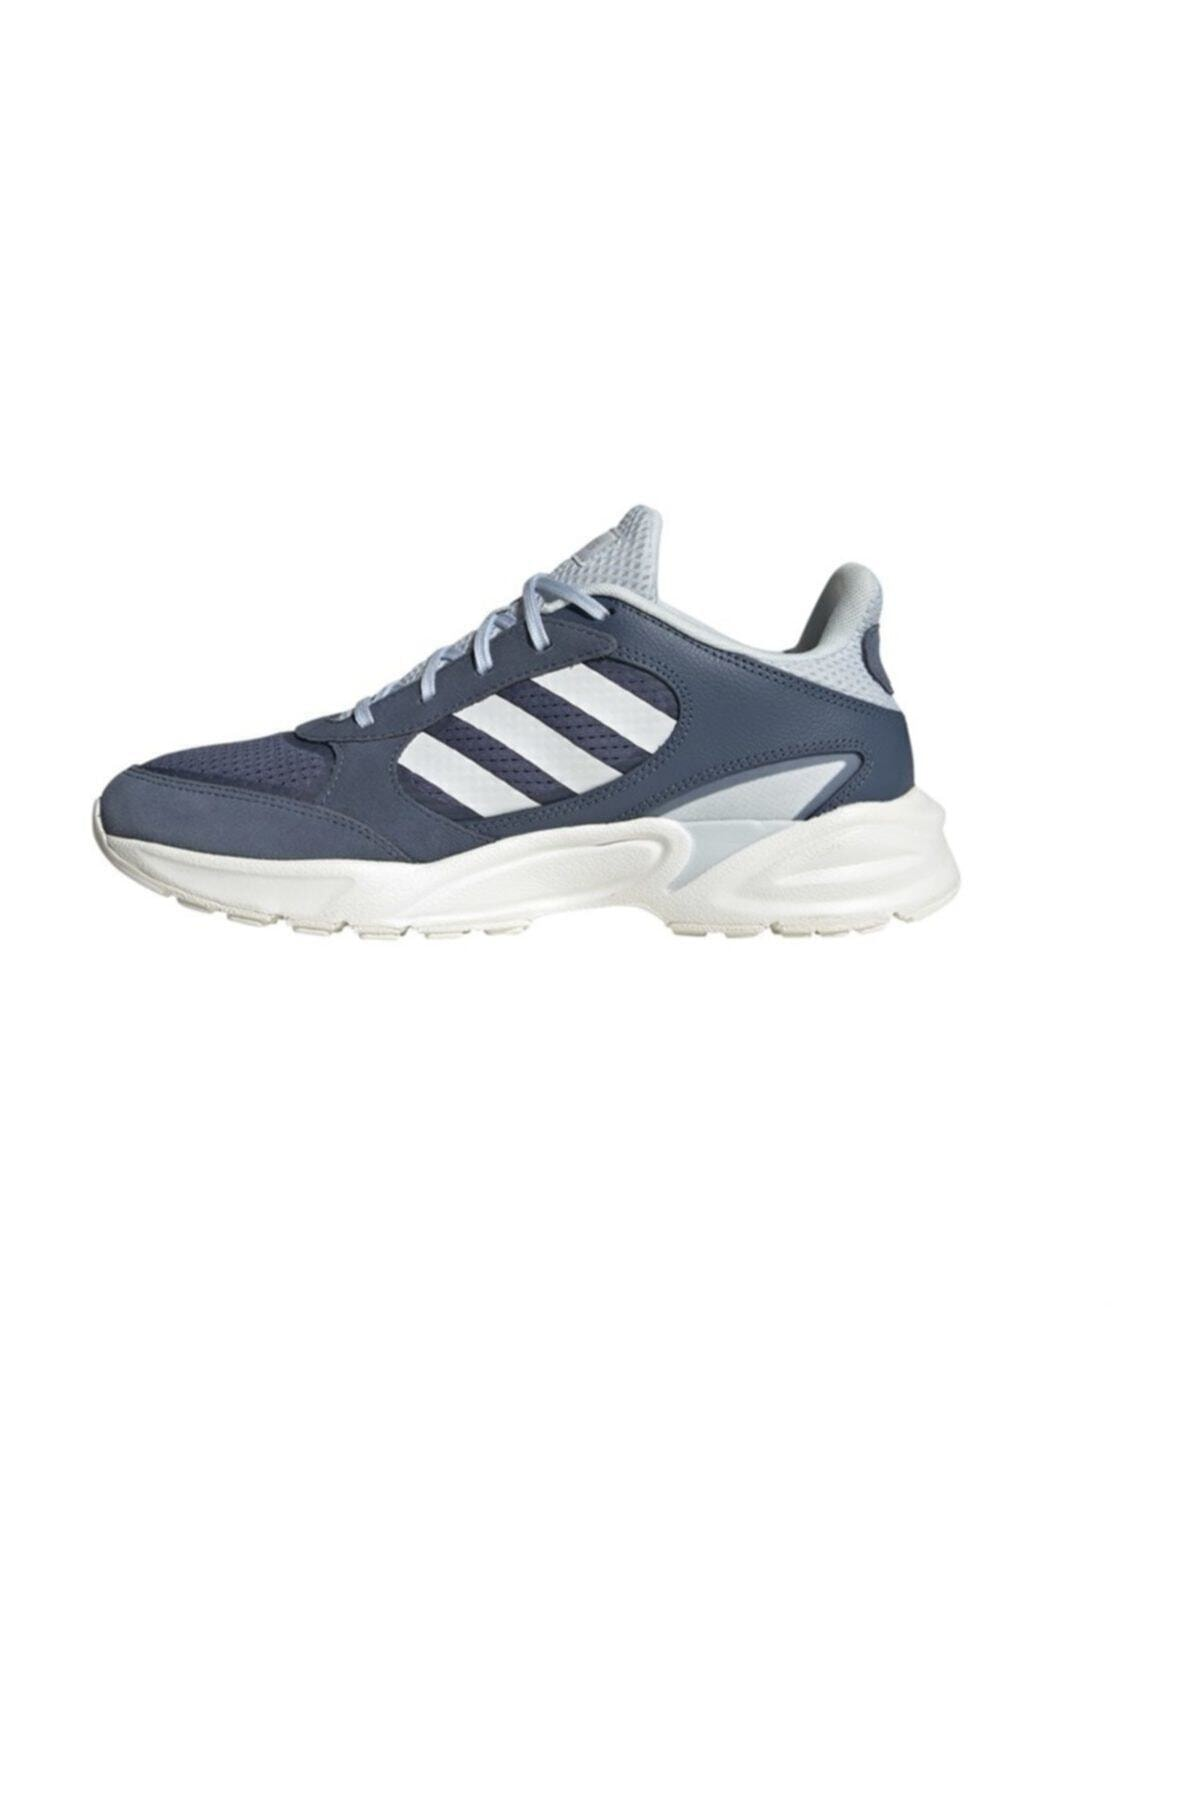 adidas Kadın Mavi Valasion Spor Ayakkabı 90s 2